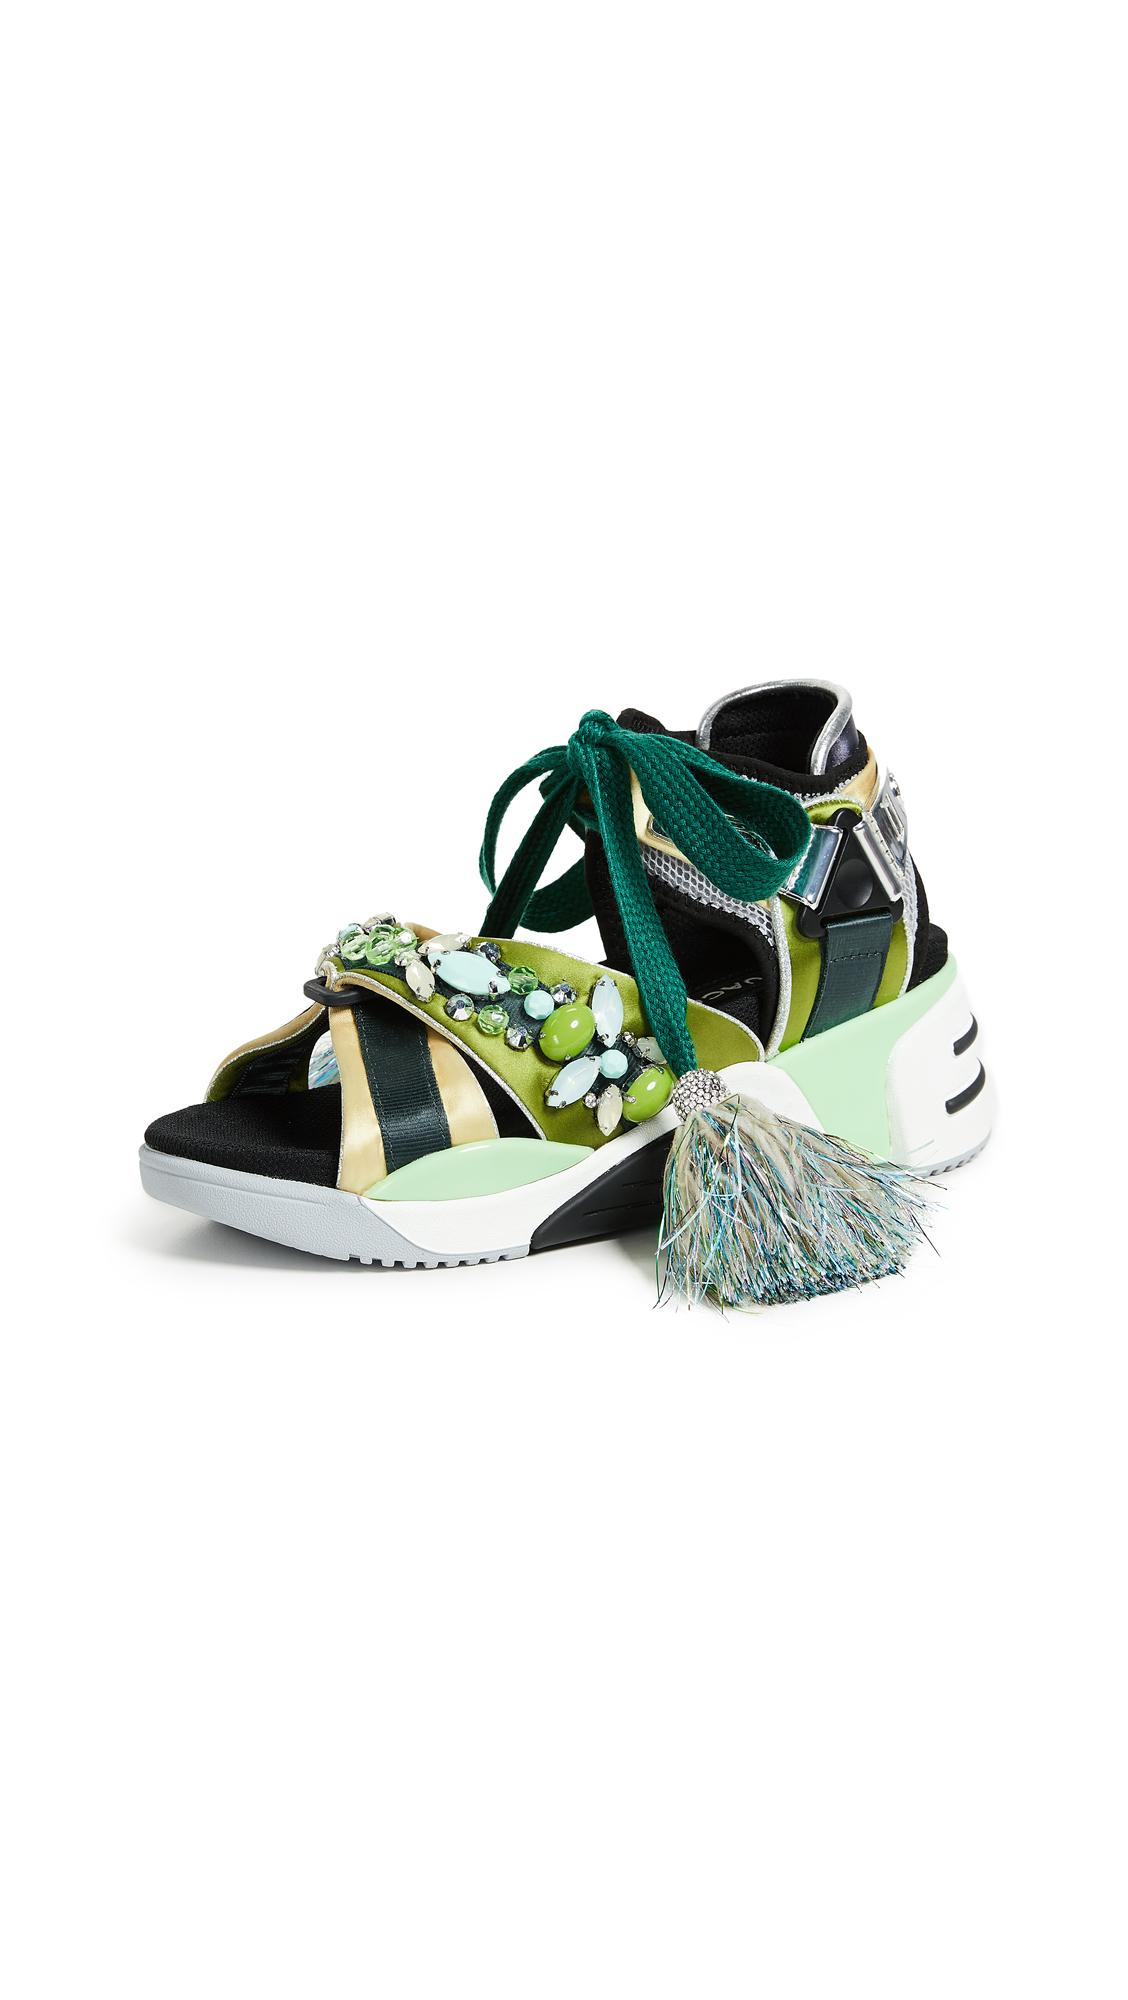 Marc Jacobs Somewhere Embellished Sport Sandals - Green Multi